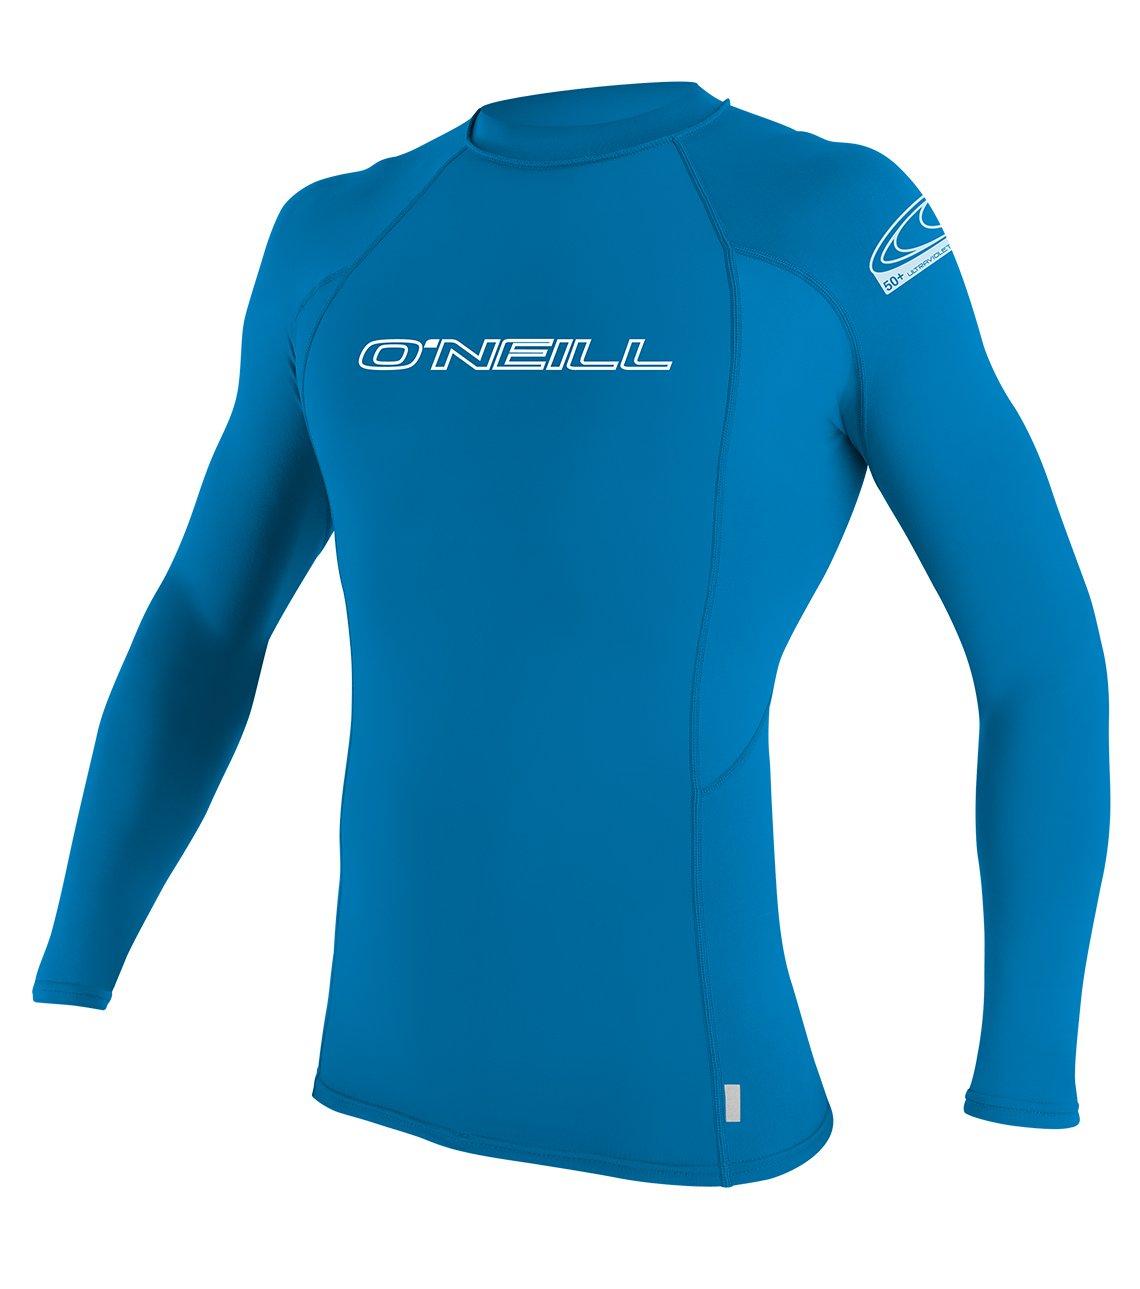 O'Neill Youth Basic Skins UPF 50+ Long Sleeve Rash Guard, Bright Blue, 12